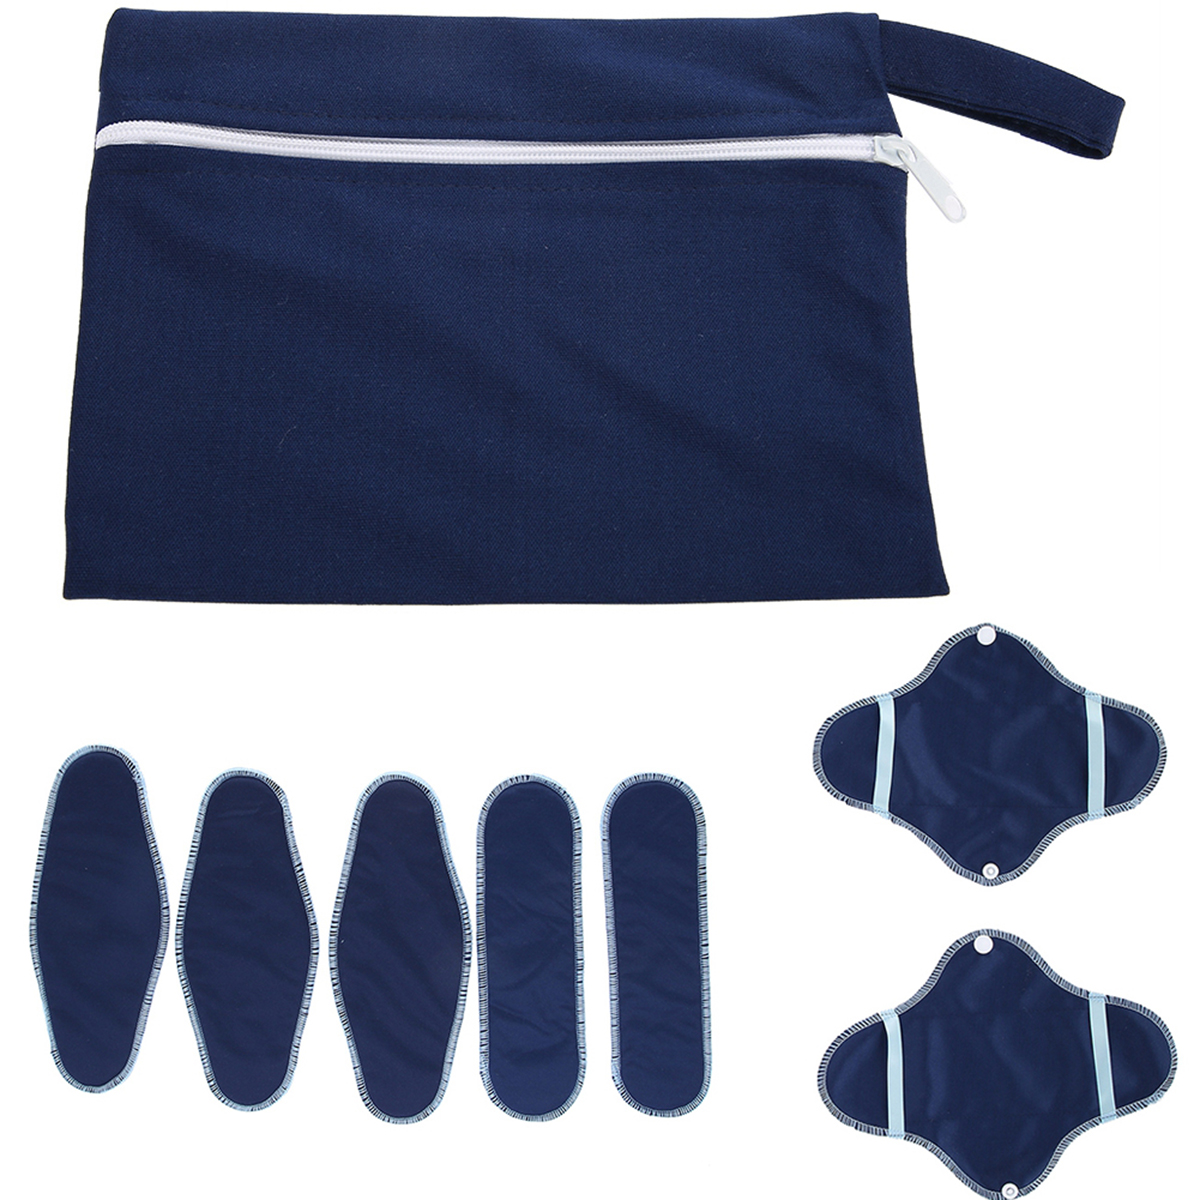 8pcs/set Reusable Natural Sanitary Napkins Washable Menstrual Pads Set Menstrual Liner Pads + Snap-on Covers + Bag Panty Liners